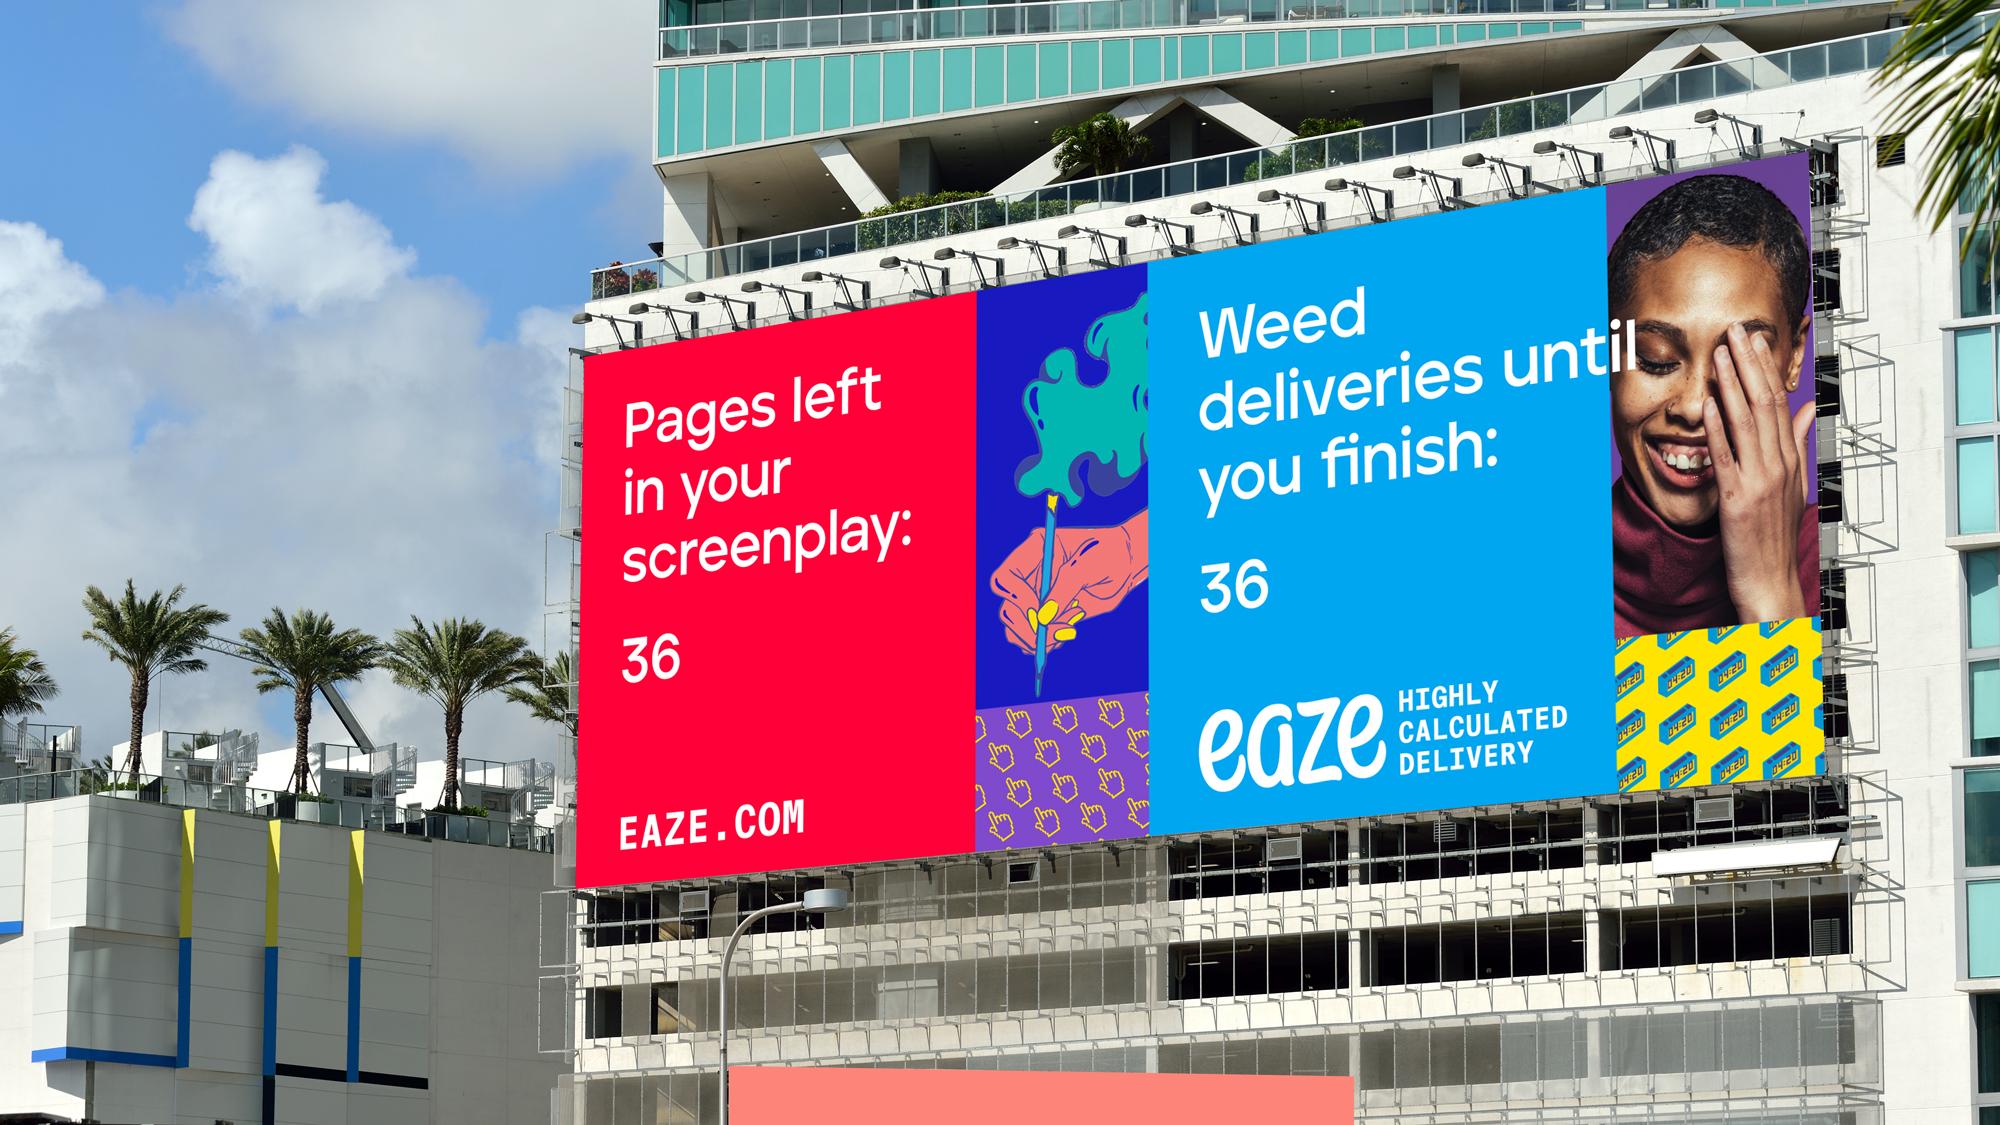 image-LA playwright billboard